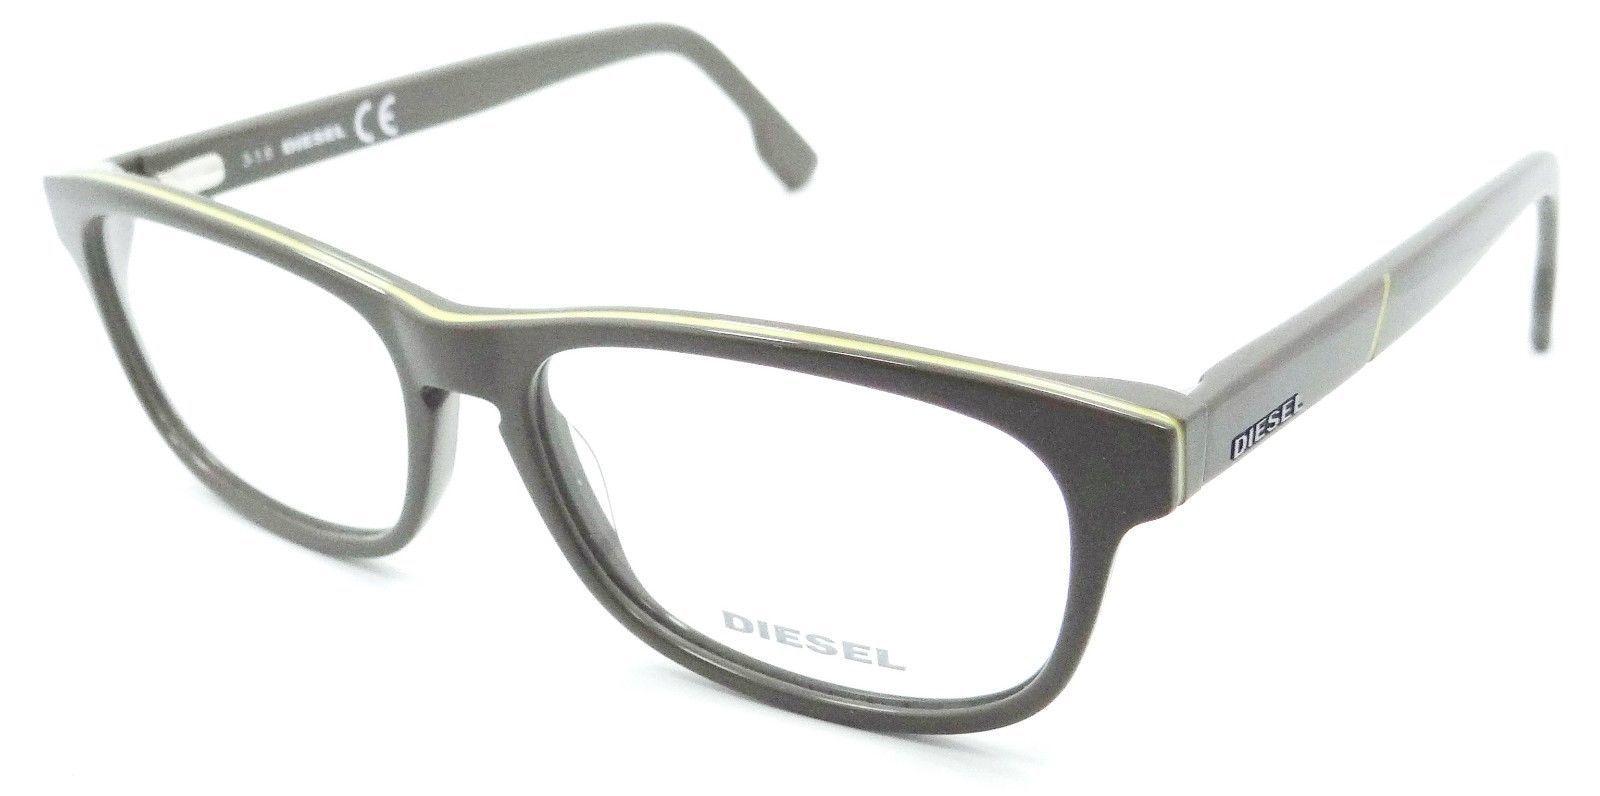 33f553ab15 Diesel Rx Eyeglasses Frames DL5197 020 and 50 similar items. 57